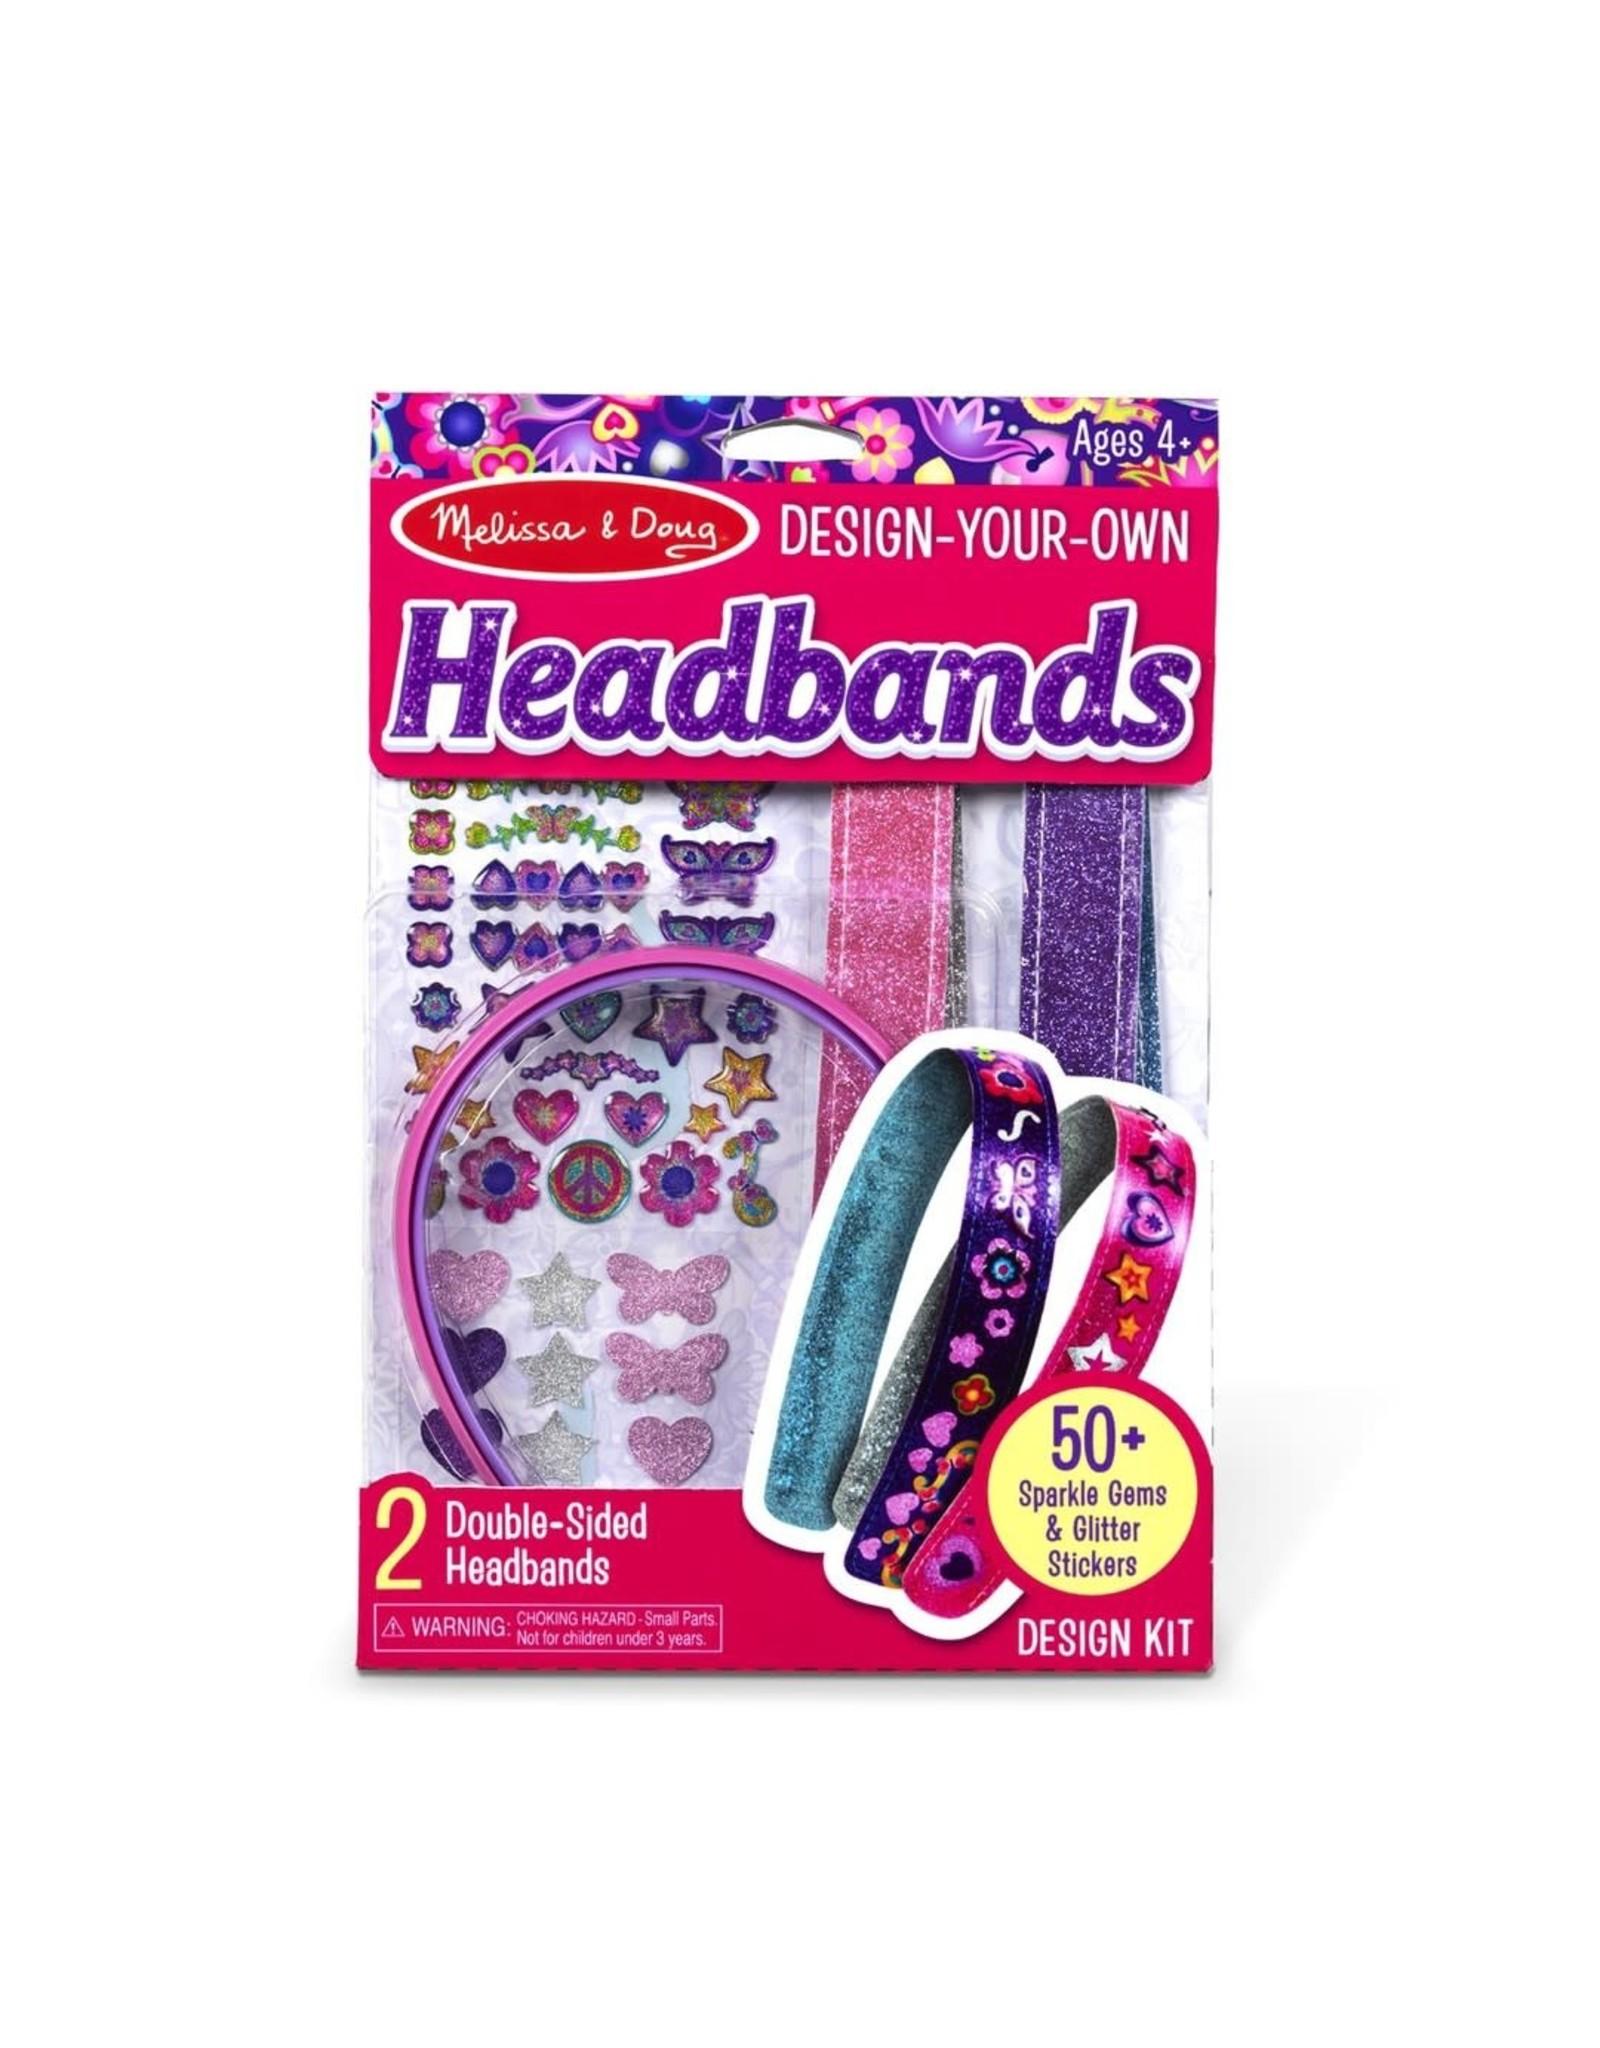 Melissa & Doug DYO Headbands